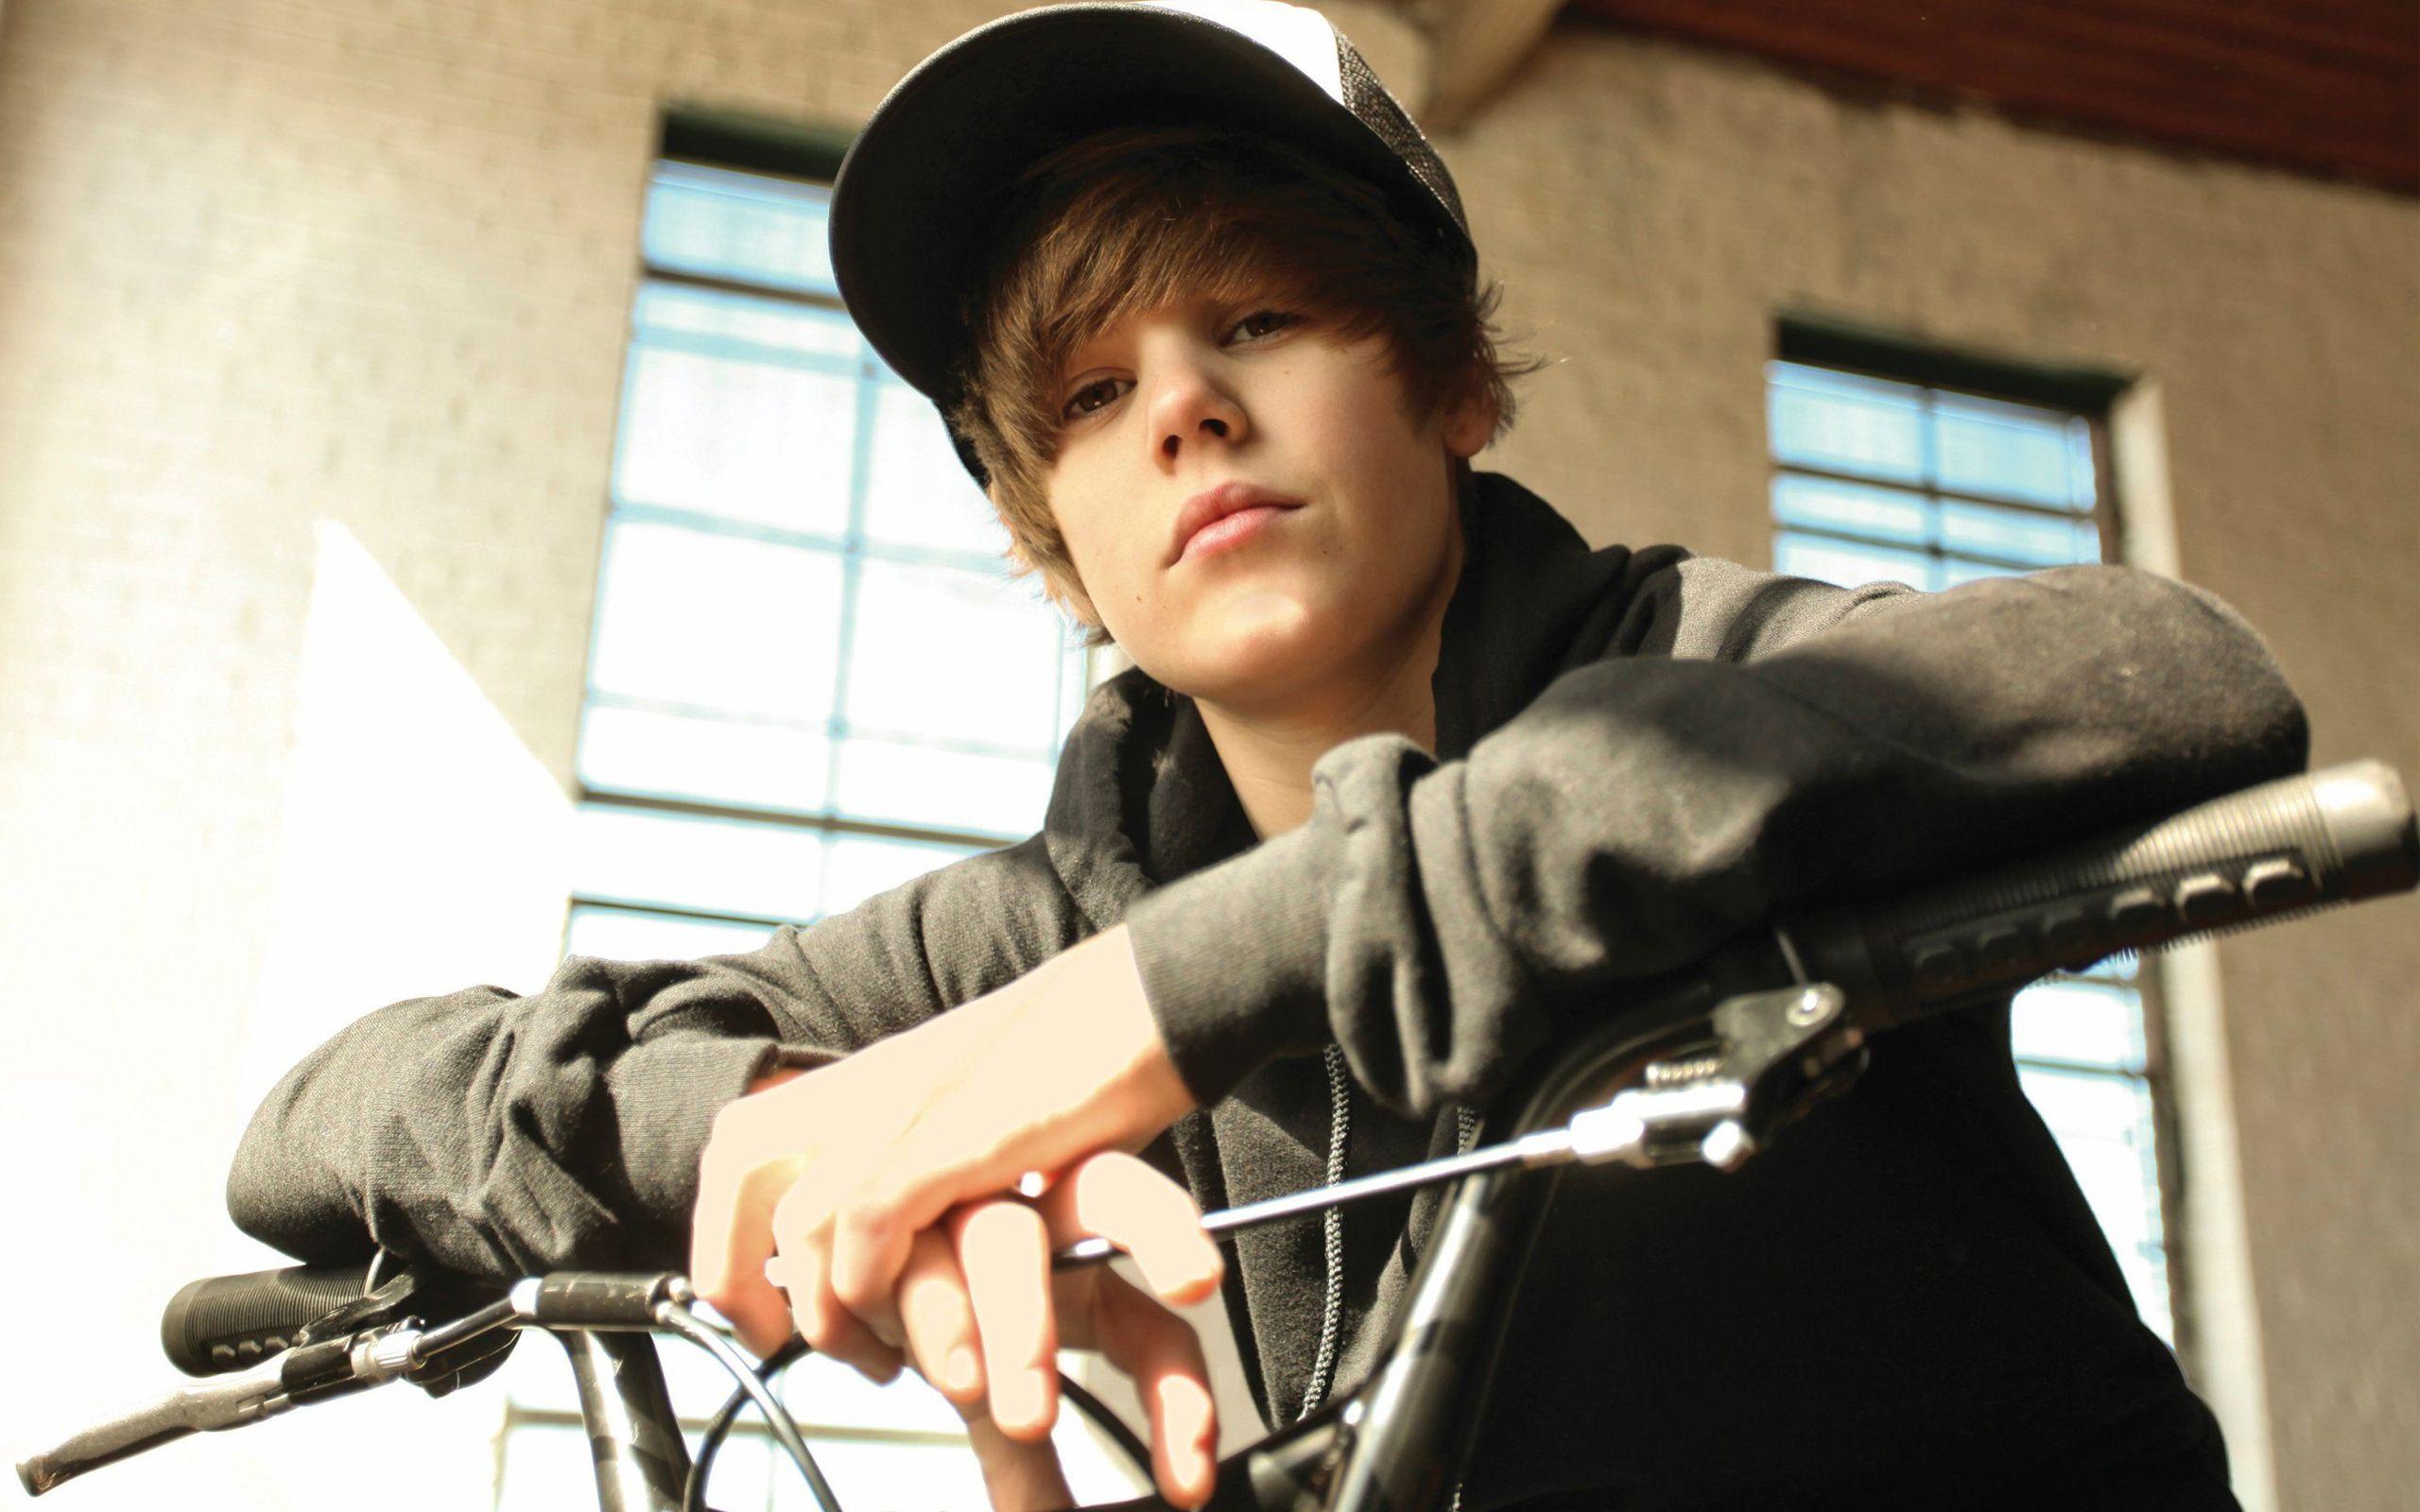 Wallpaper download justin bieber - Justin Bieber Live Wallpaper Download Justin Bieber Live